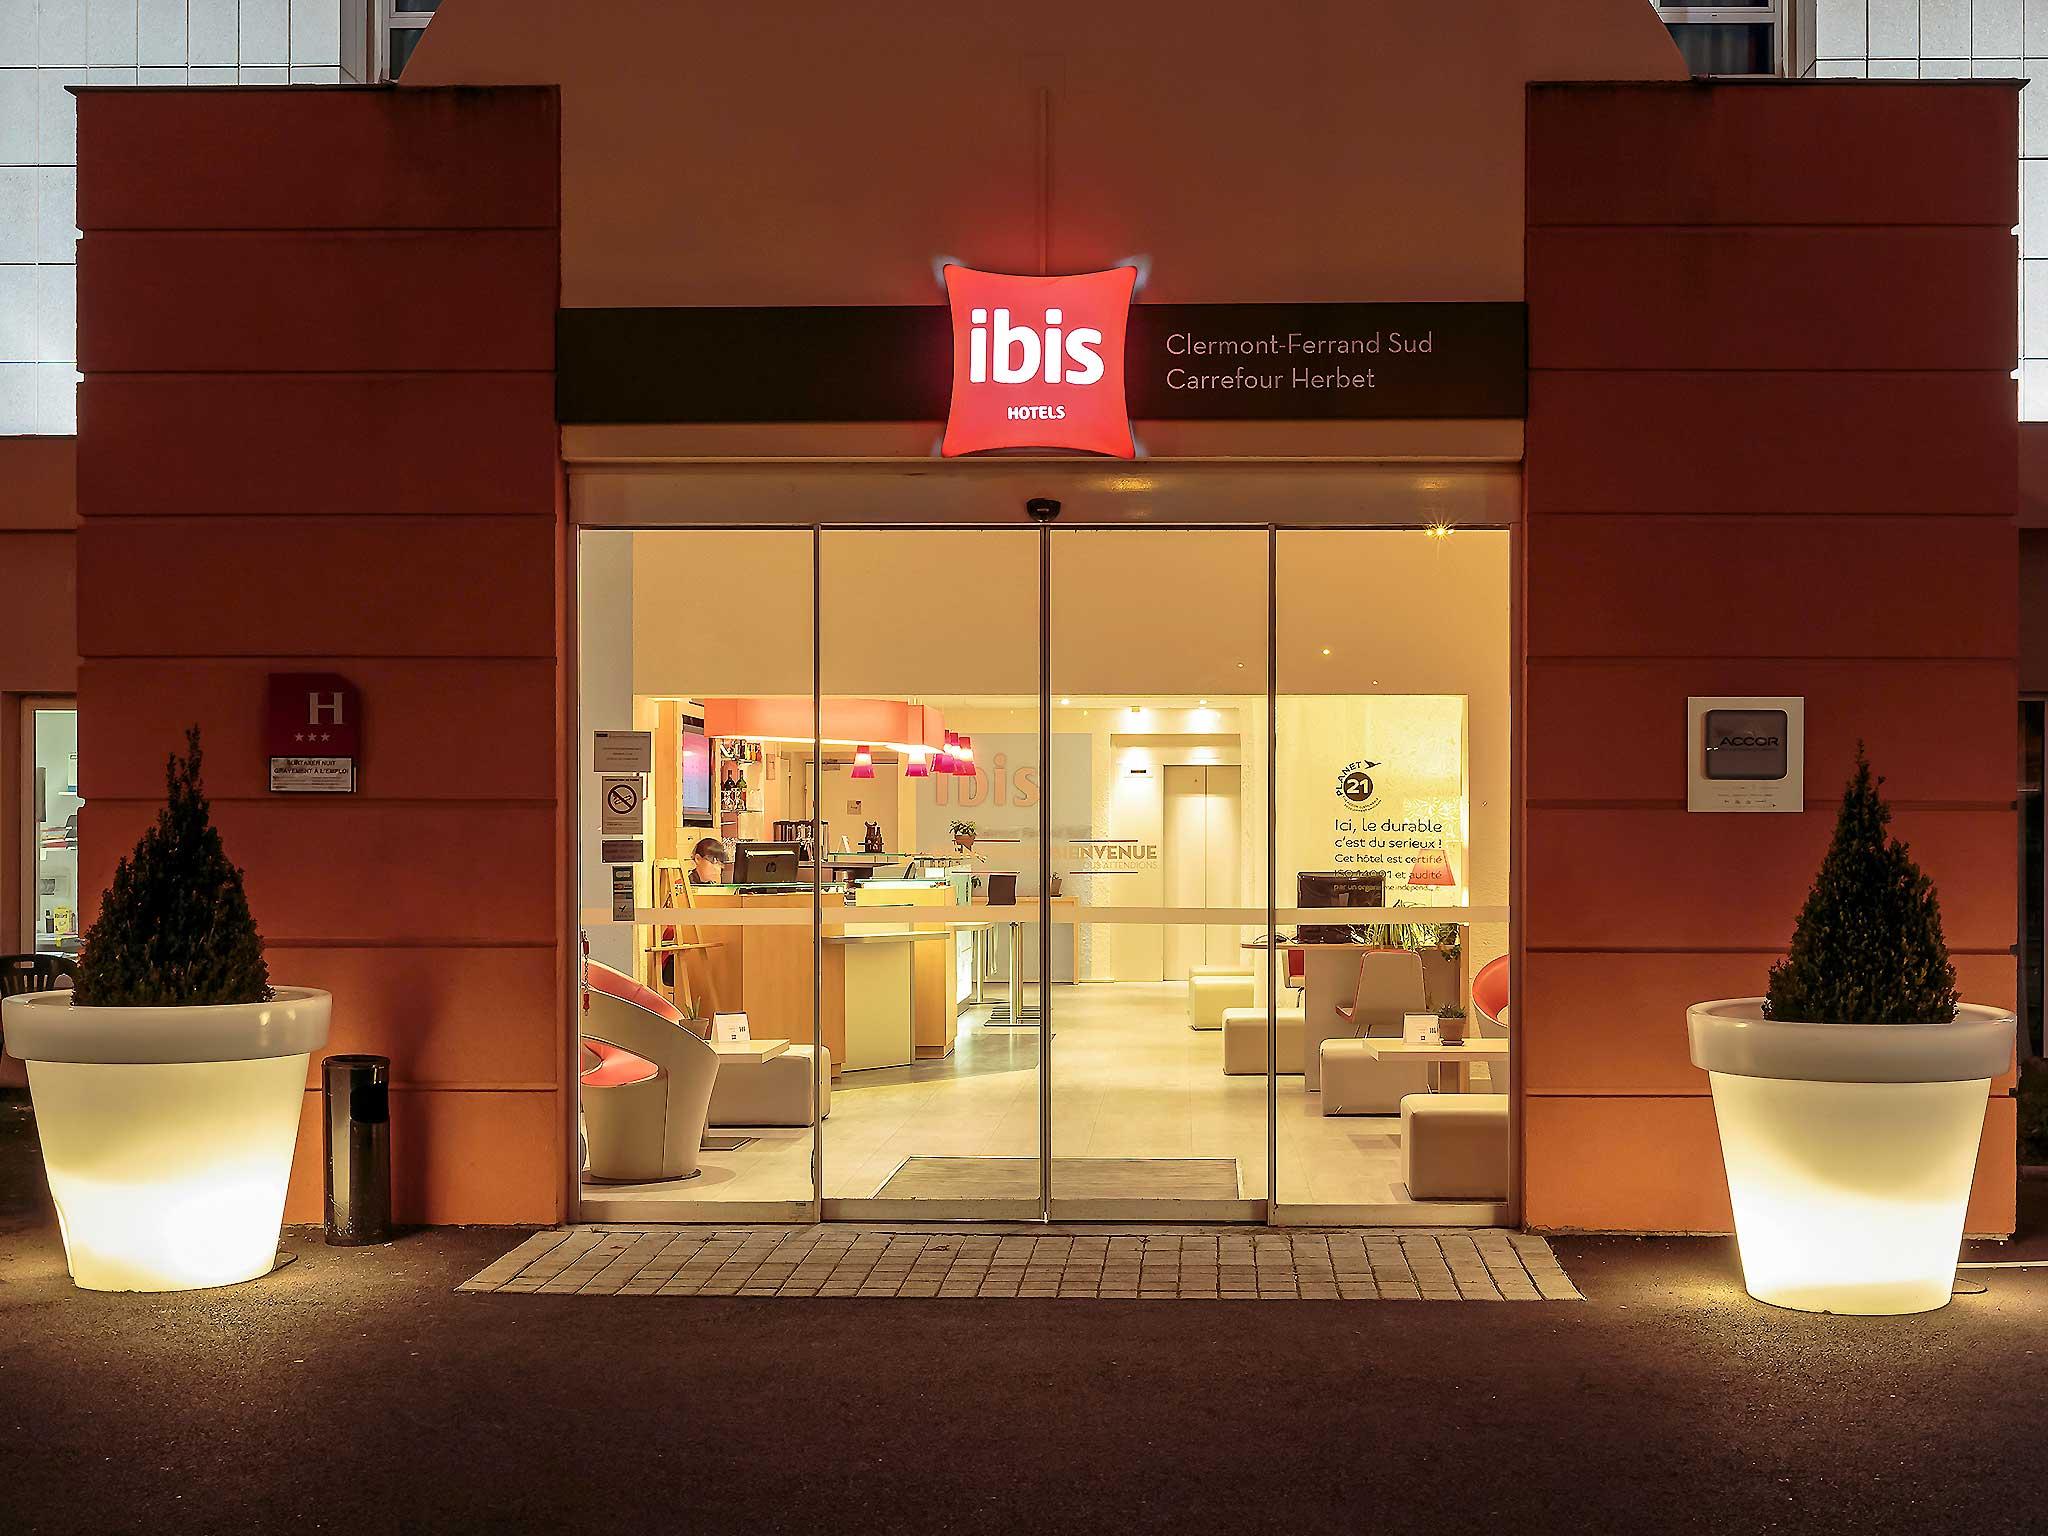 Hotel – ibis Clermont-Ferrand Sud Carrefour Herbet